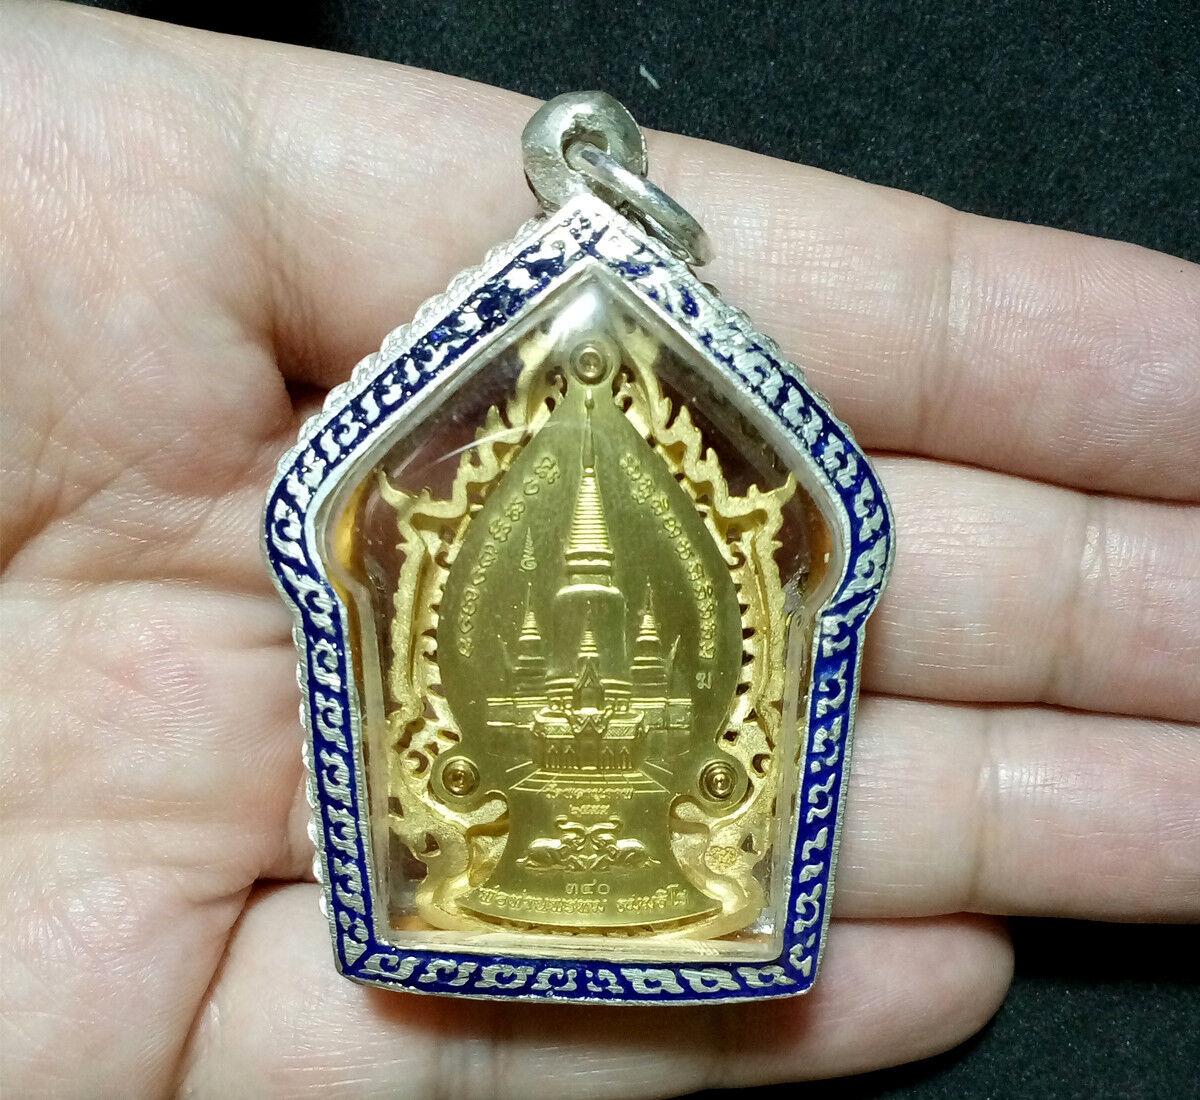 PHRA PIDTA LP RARE OLD THAI BUDDHA AMULET PENDANT MAGIC ANCIENT IDOL#340